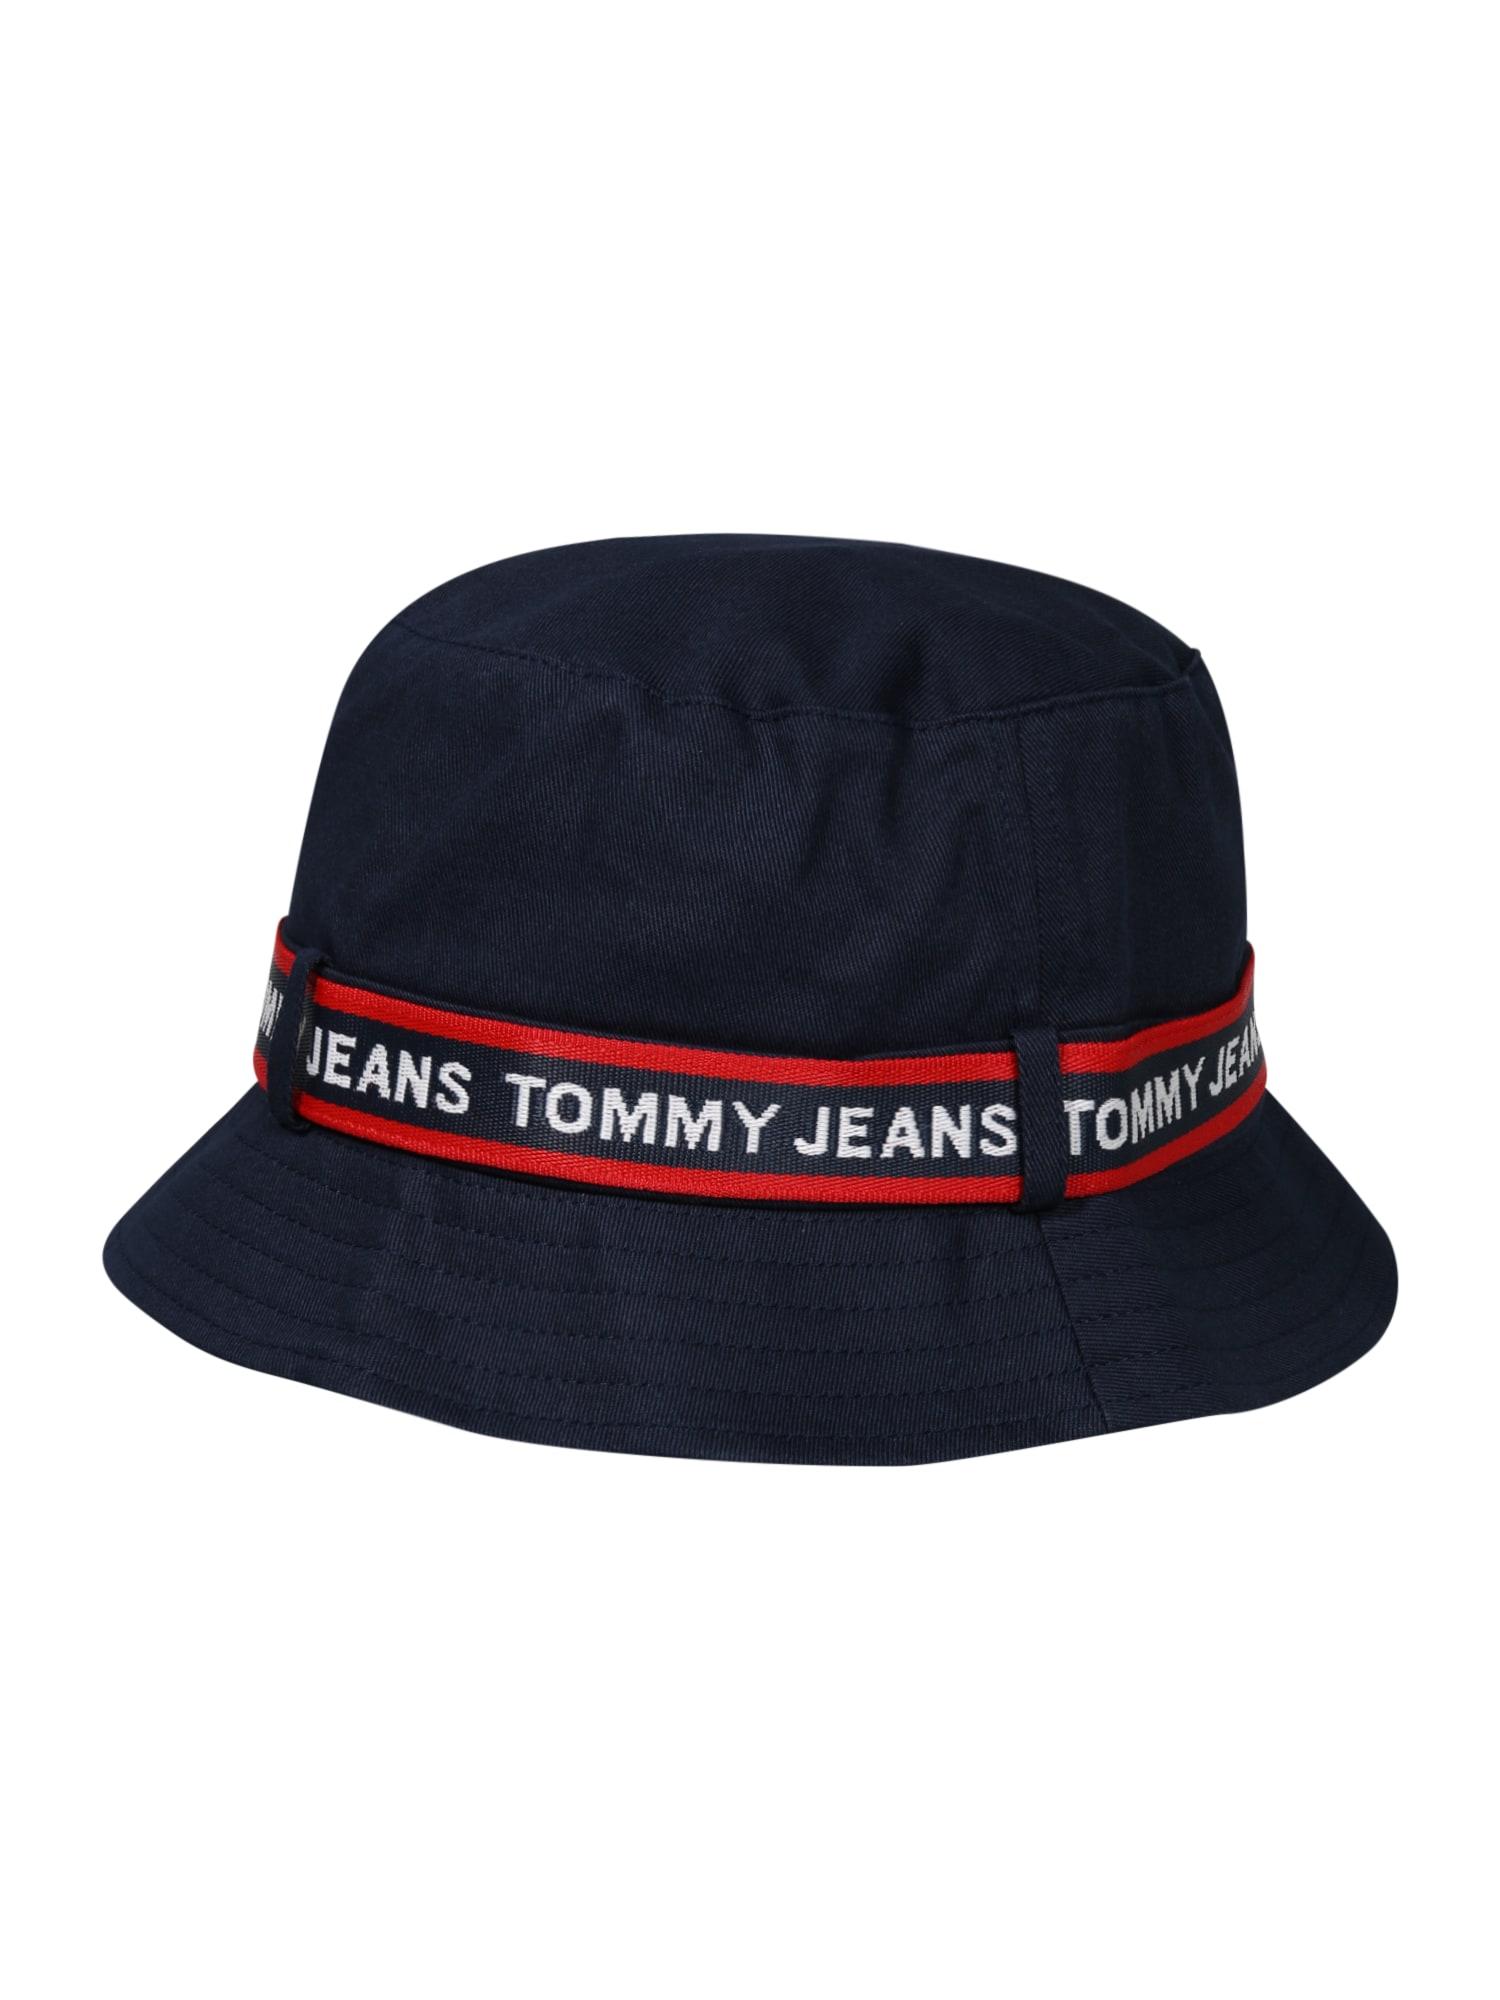 Tommy Jeans Skrybėlaitė raudona / nakties mėlyna